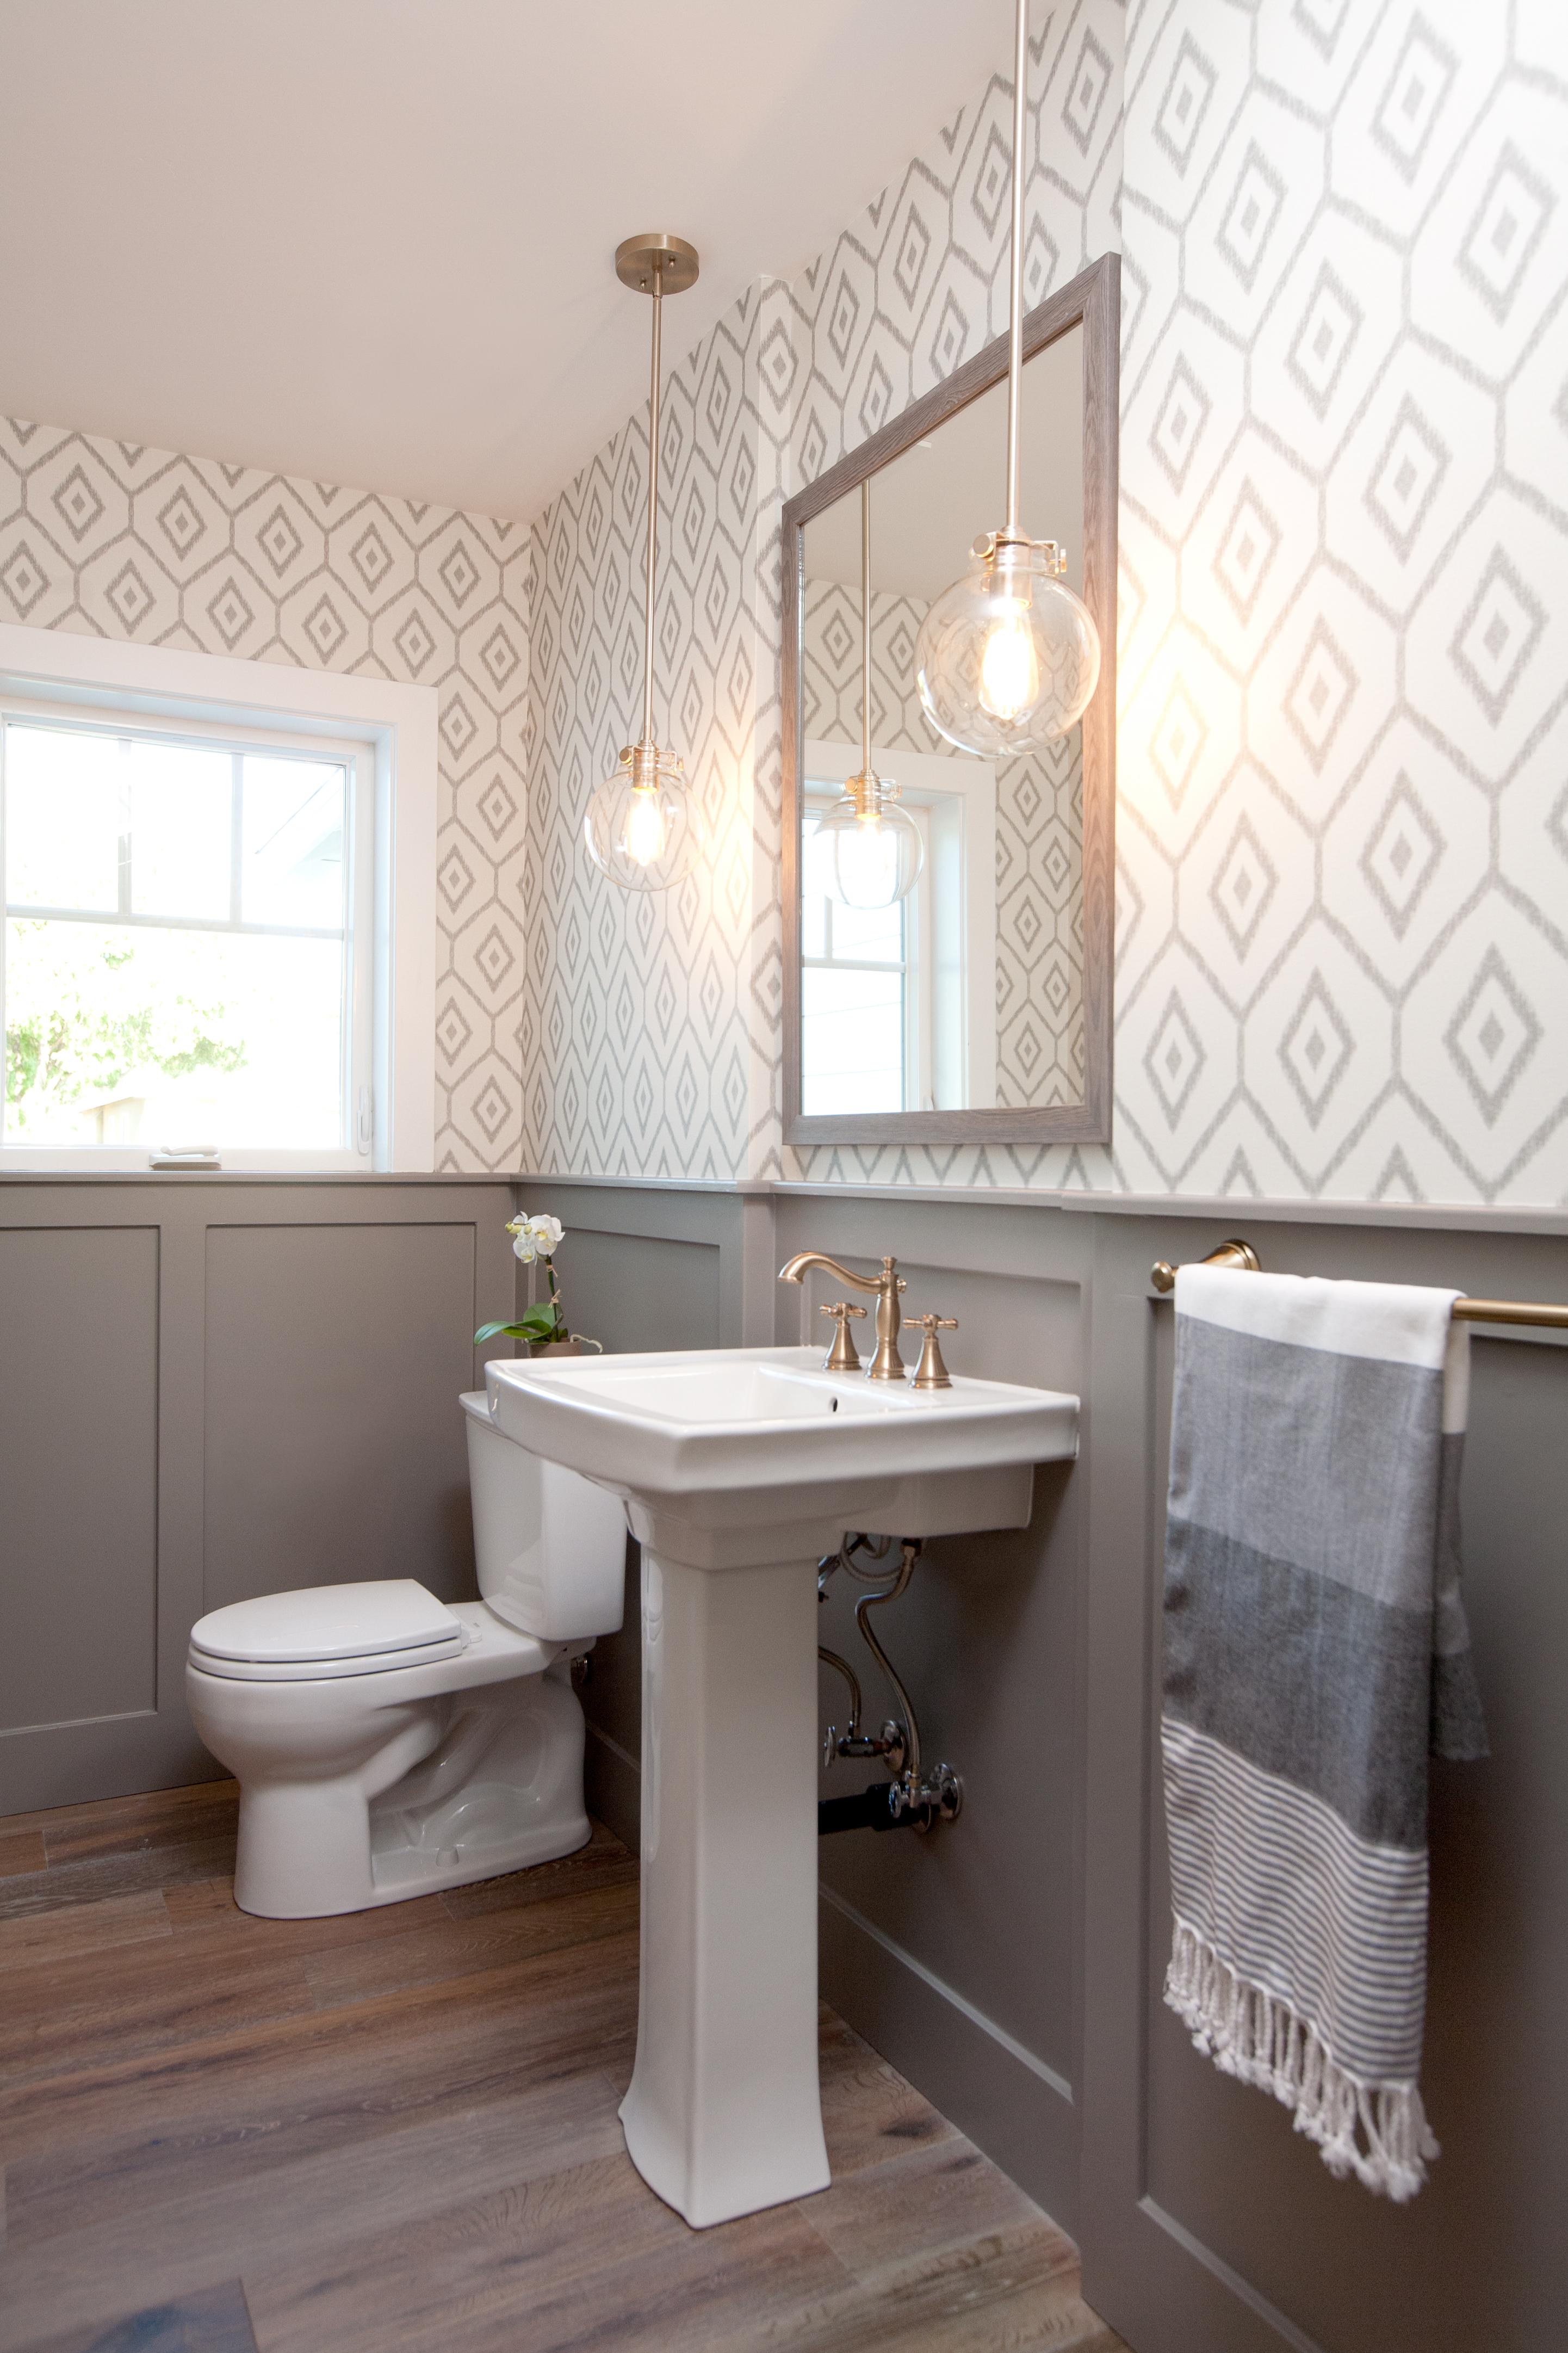 Arcadia-House-Edit-wallpaper-wp5402351